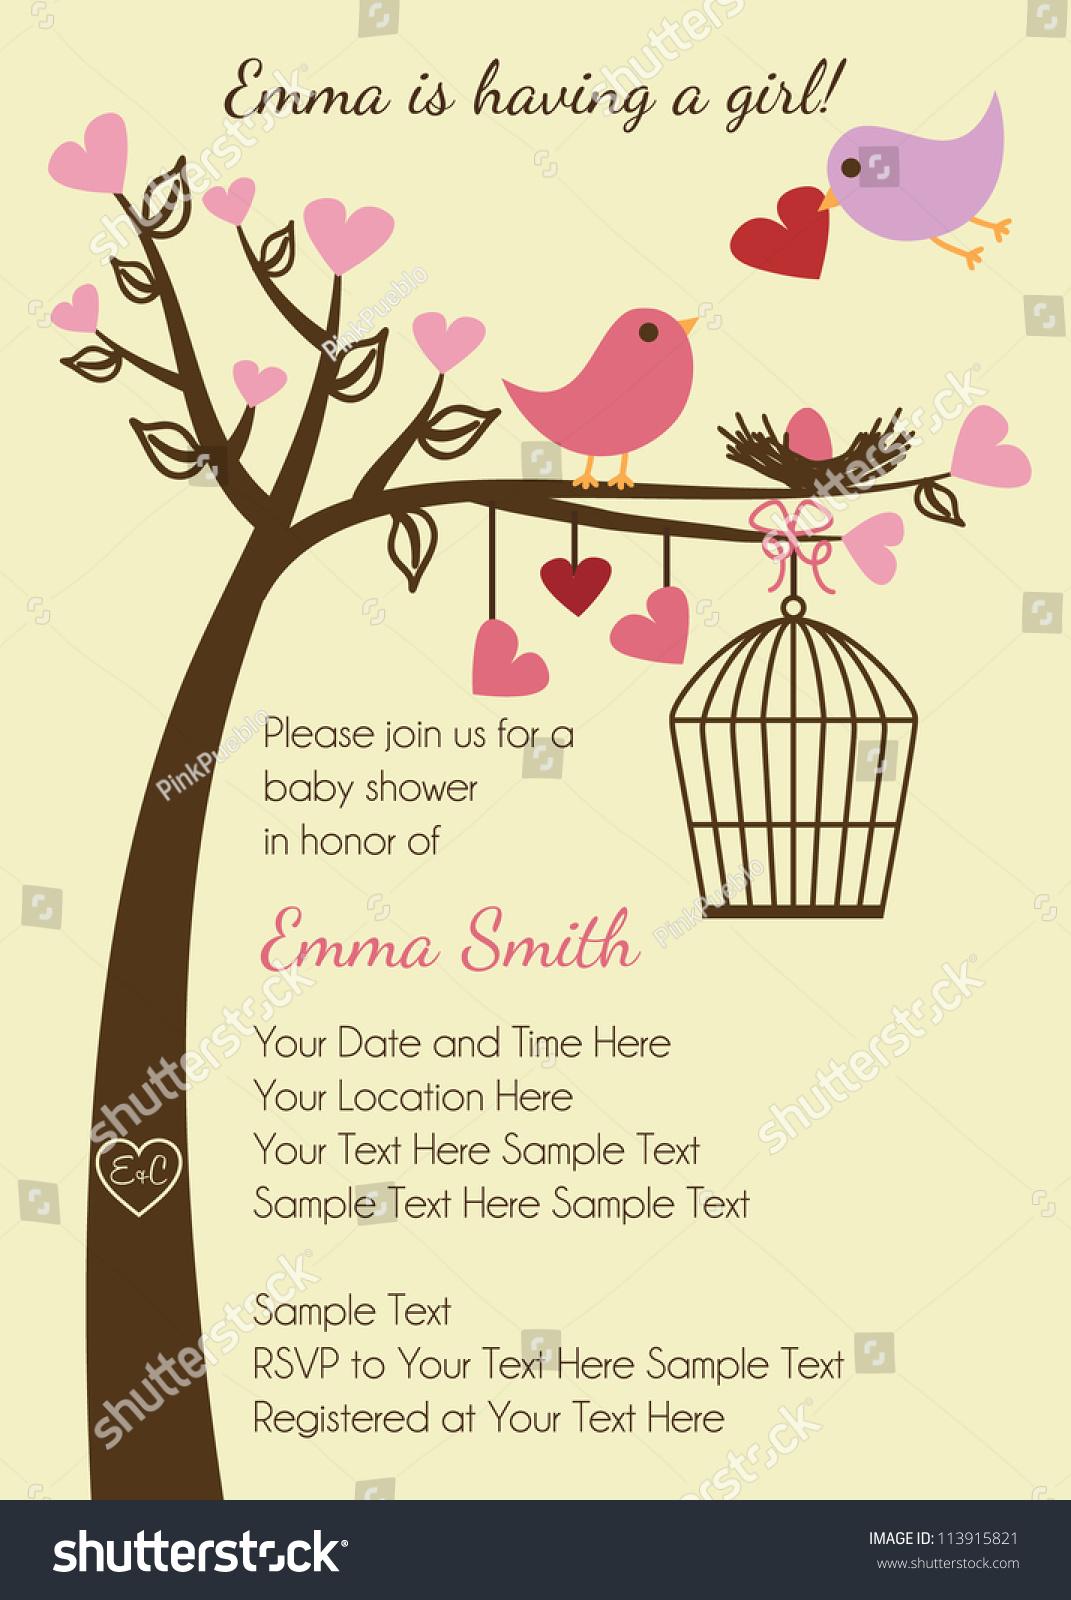 Bird Family Baby Shower Invitation Template Stock Vector Illustration 113915821 : Shutterstock